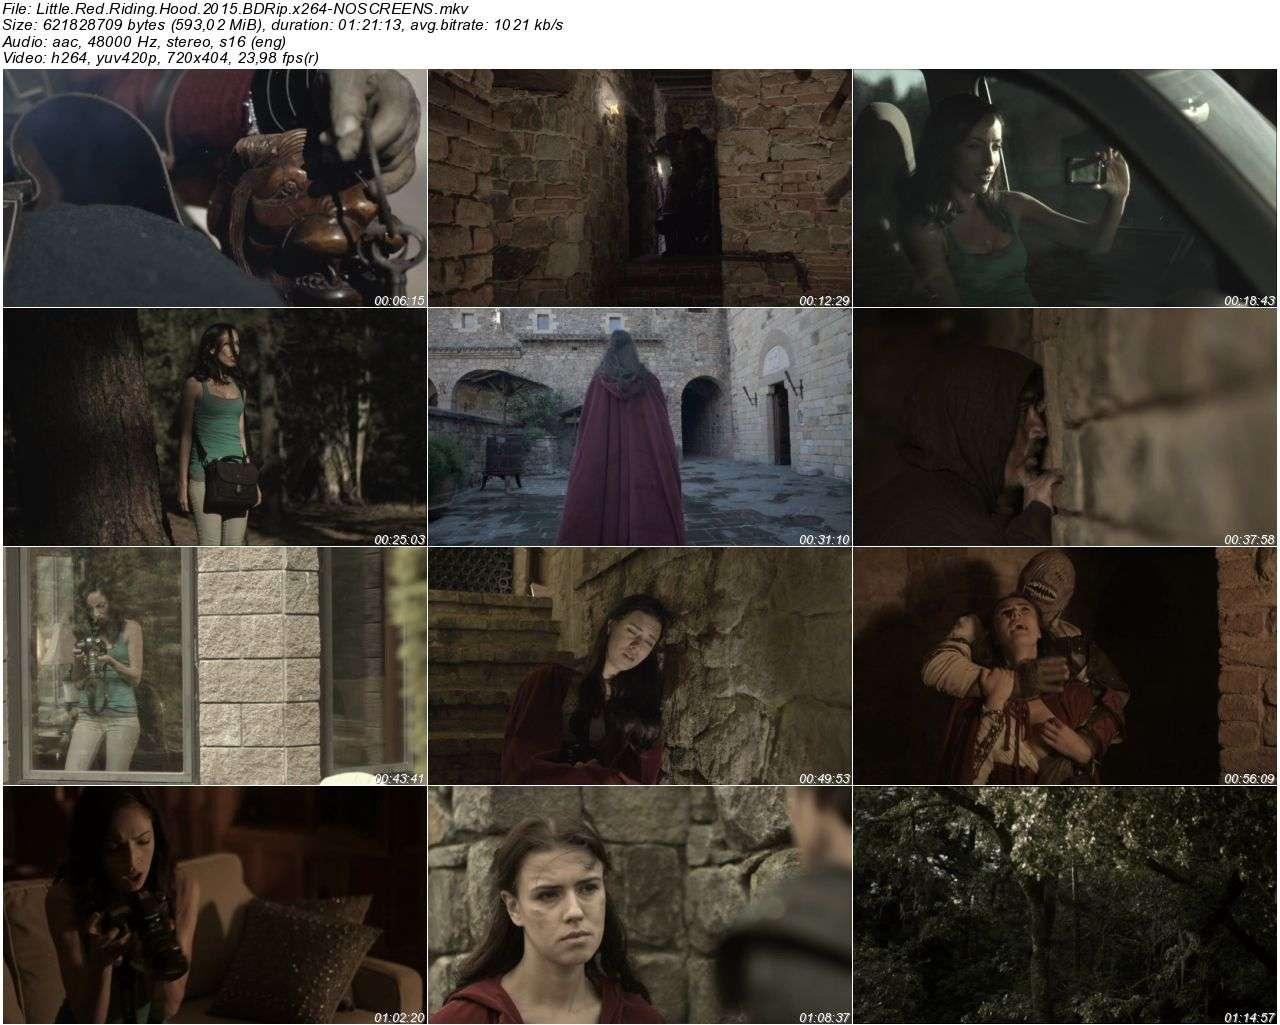 Little Red Riding Hood - 2015 BRRip XviD AC3 - Türkçe Altyazılı Tek Link indir